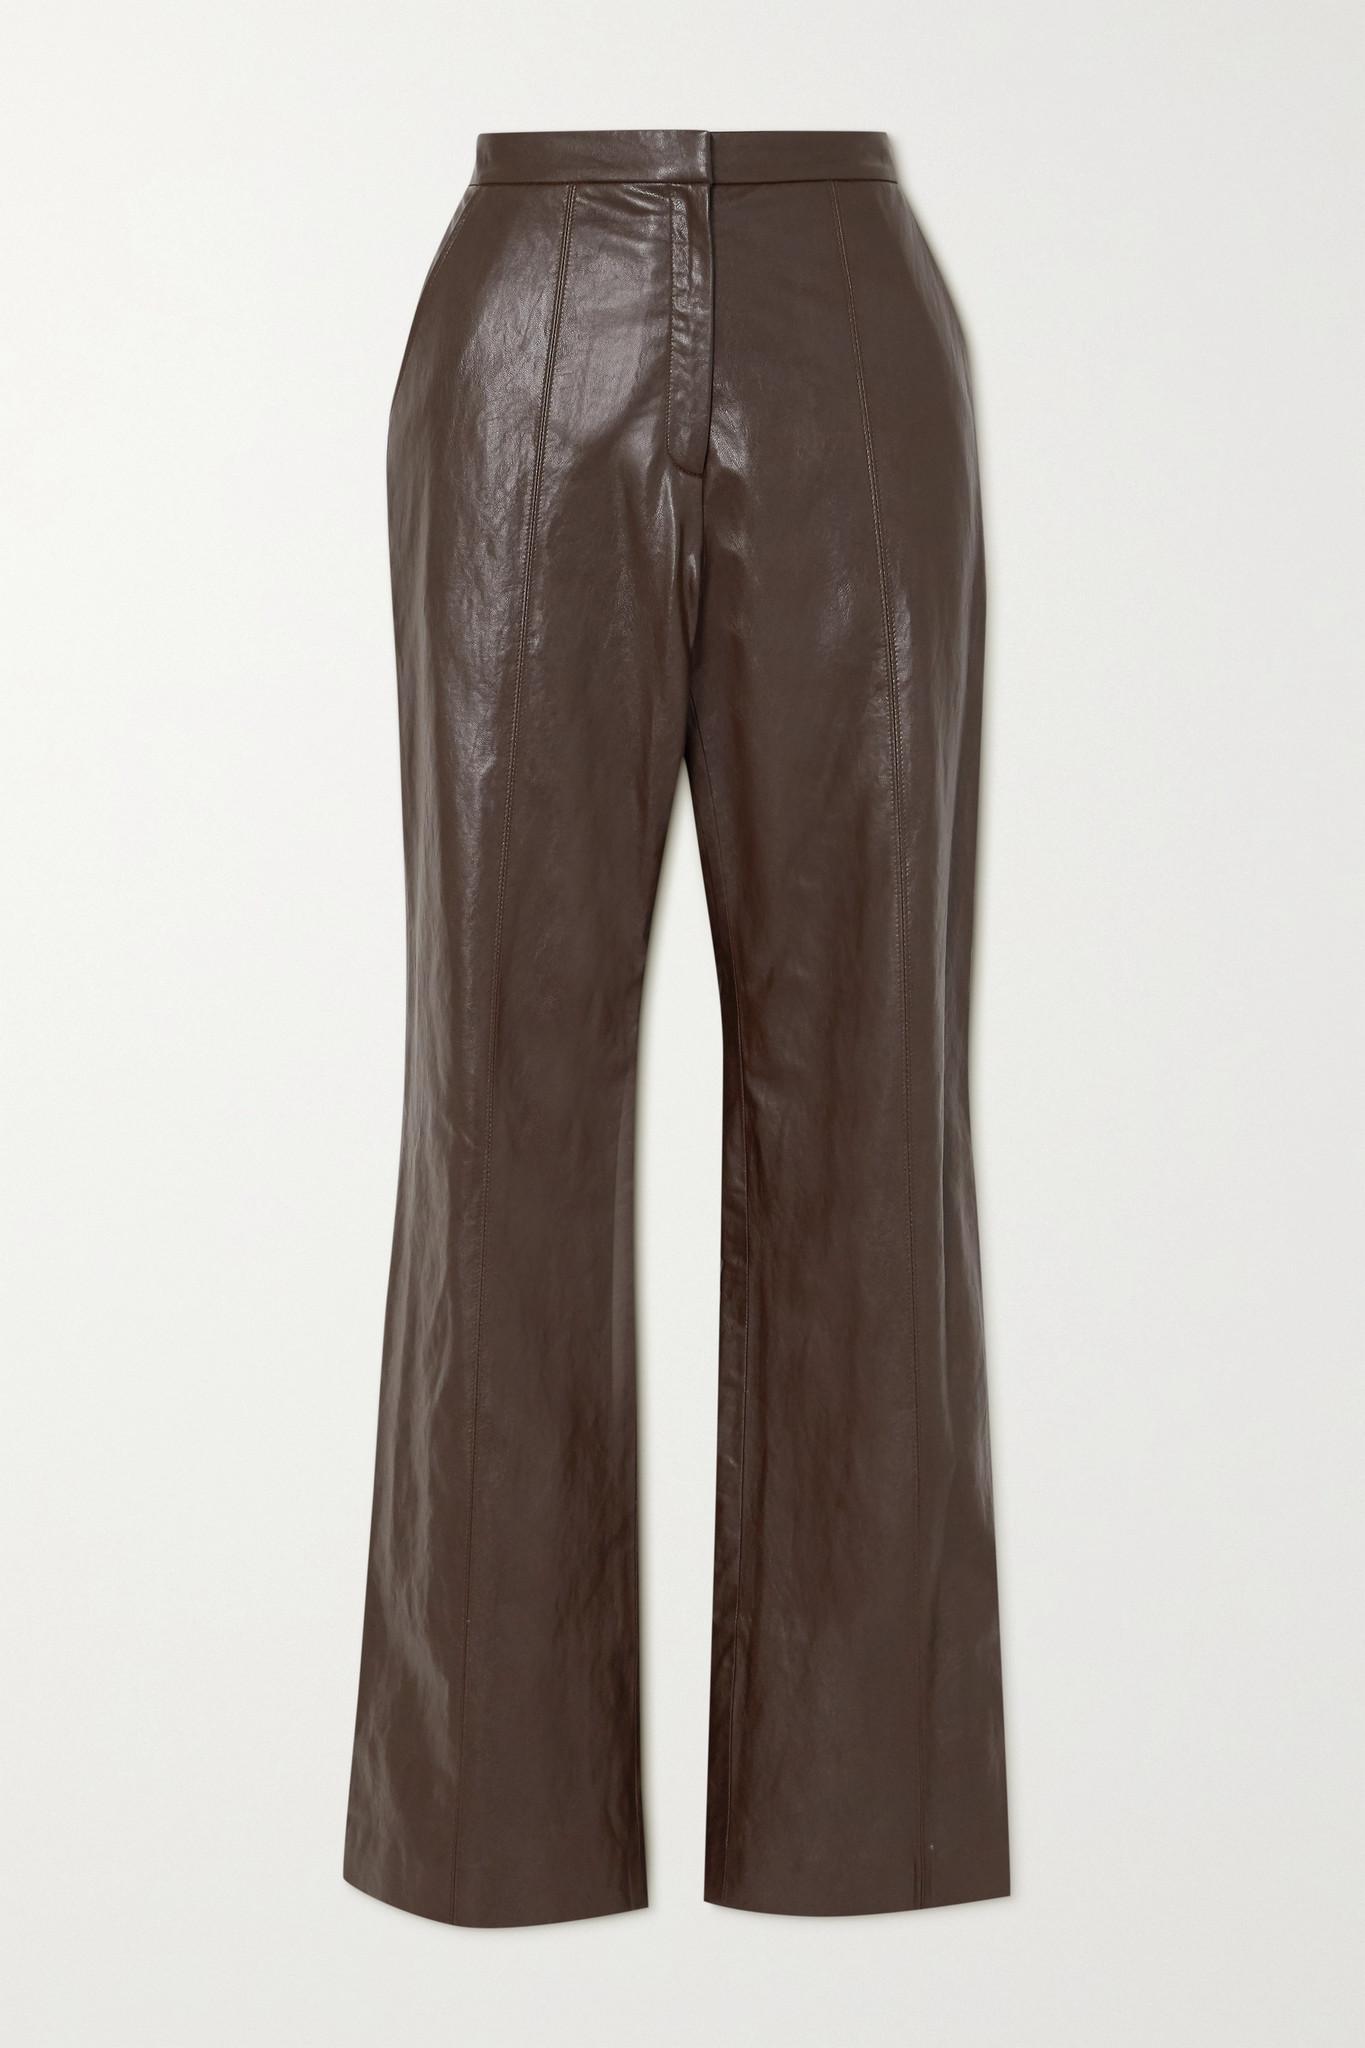 LVIR - 人造皮革直筒裤 - 棕色 - FR38